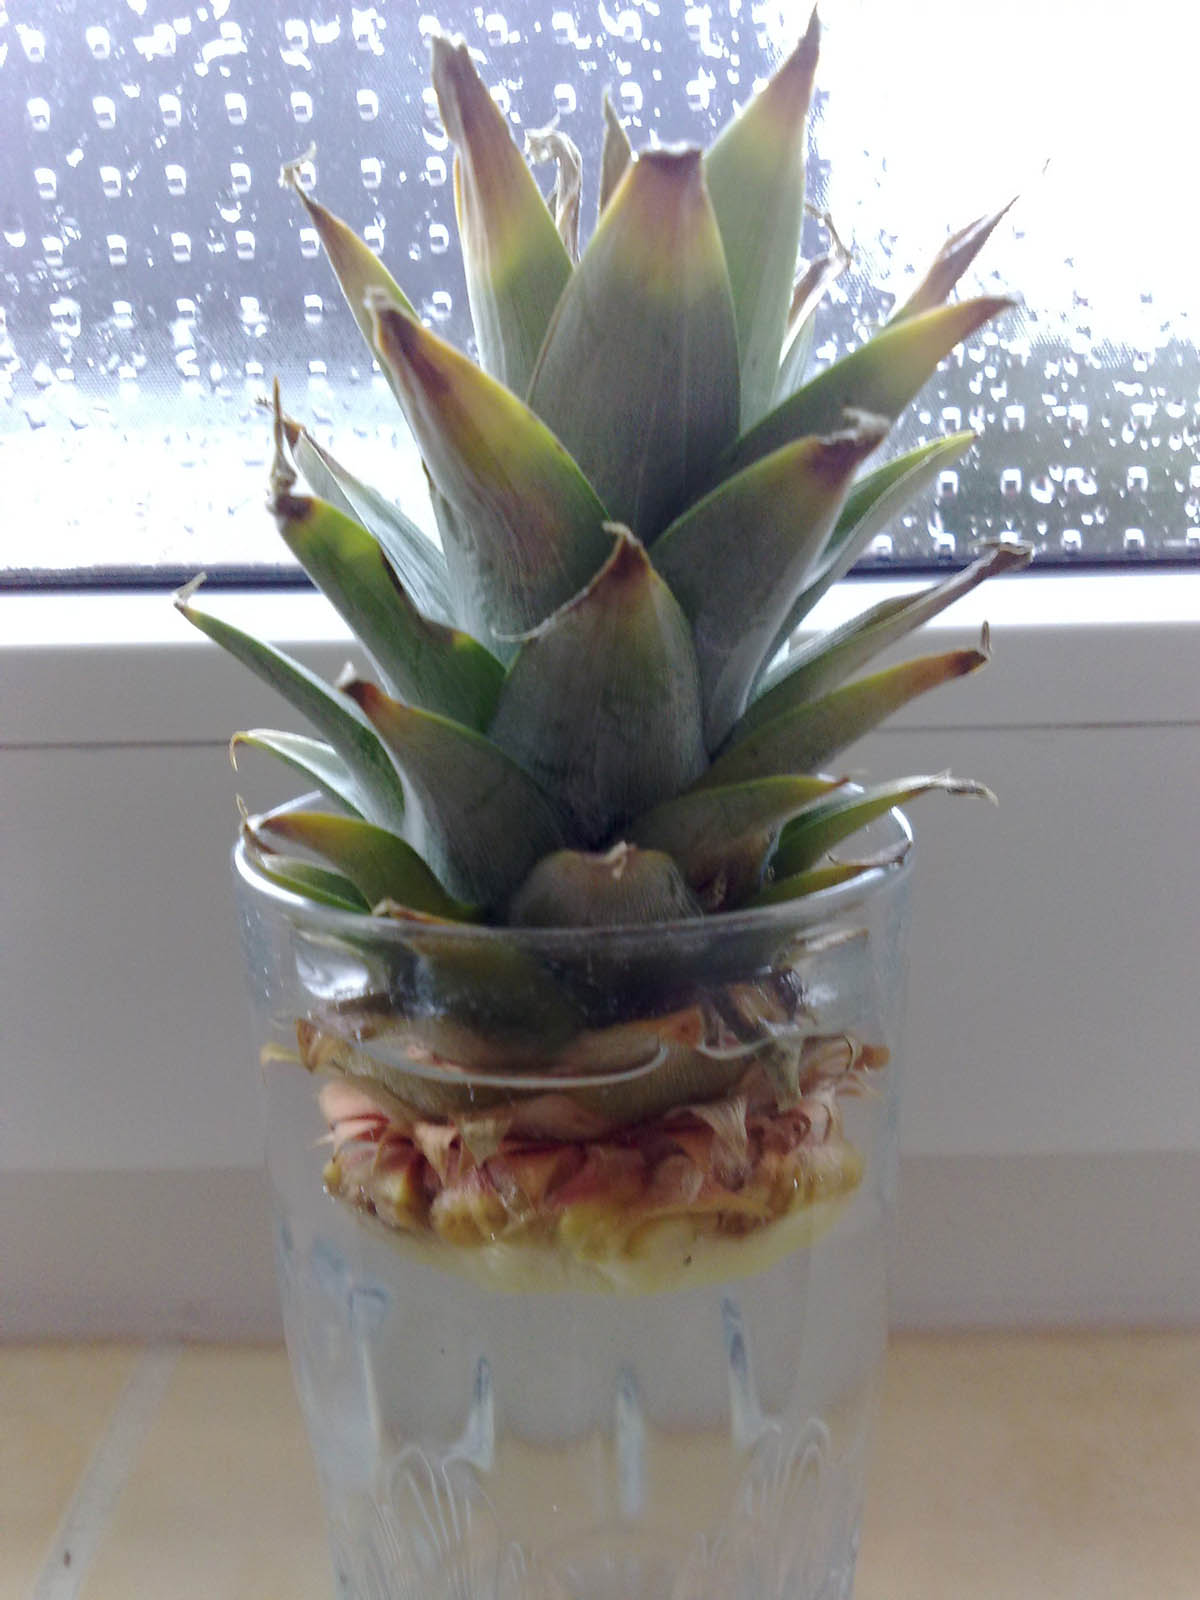 anzuchtanleitung ananas vegetative methode vegetation